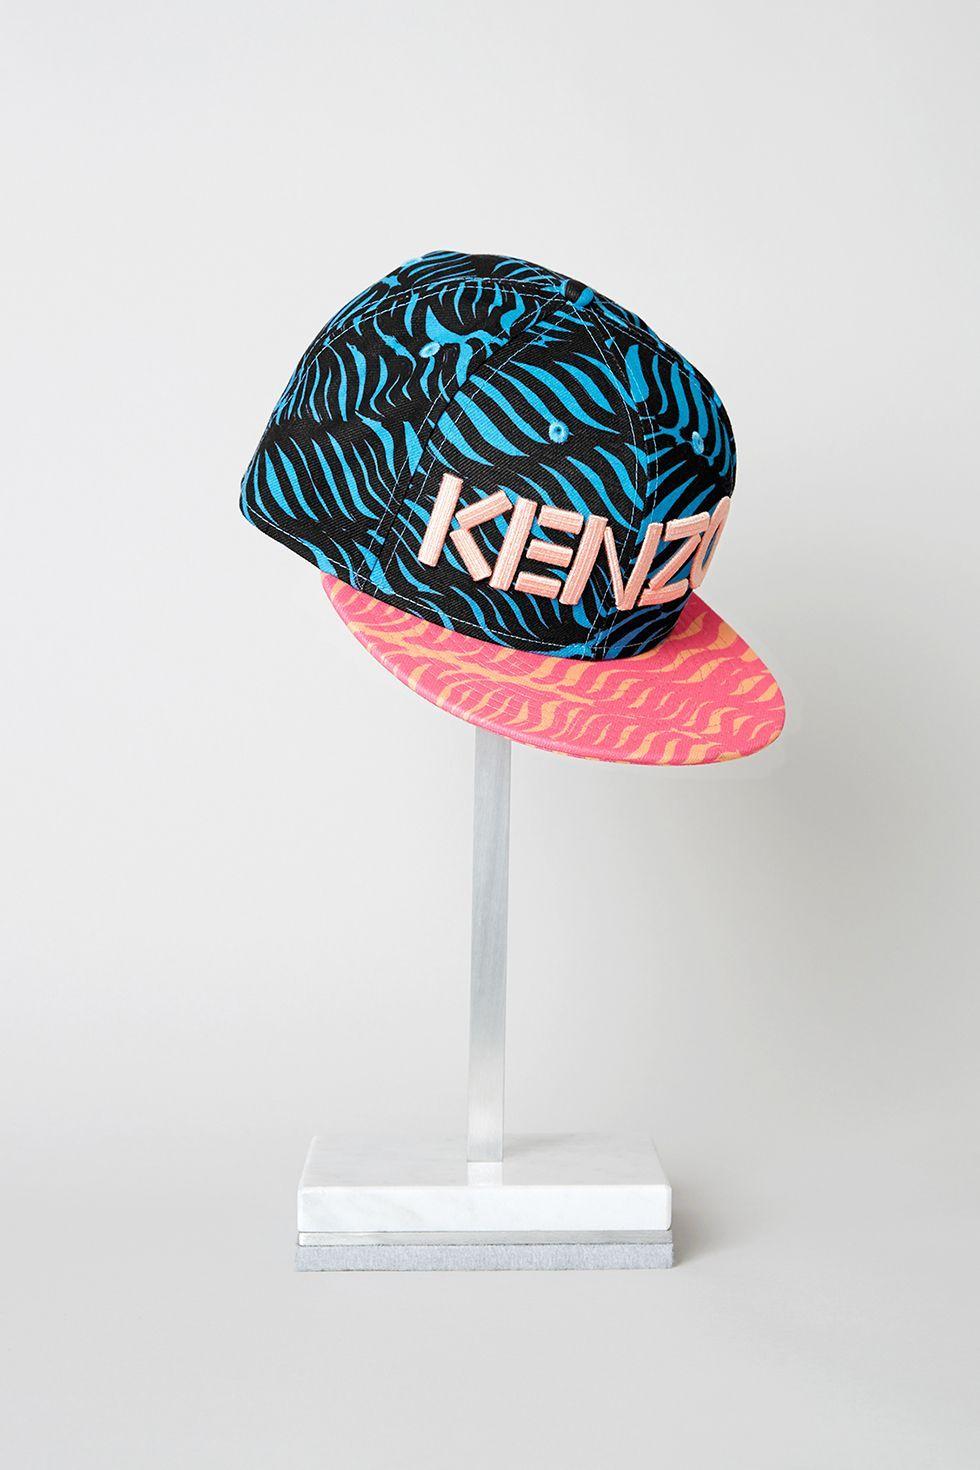 47347899ba9 Kenzo New Era Waves - Kenzo KENZO x NEW ERA Women - Kenzo E-shop ...